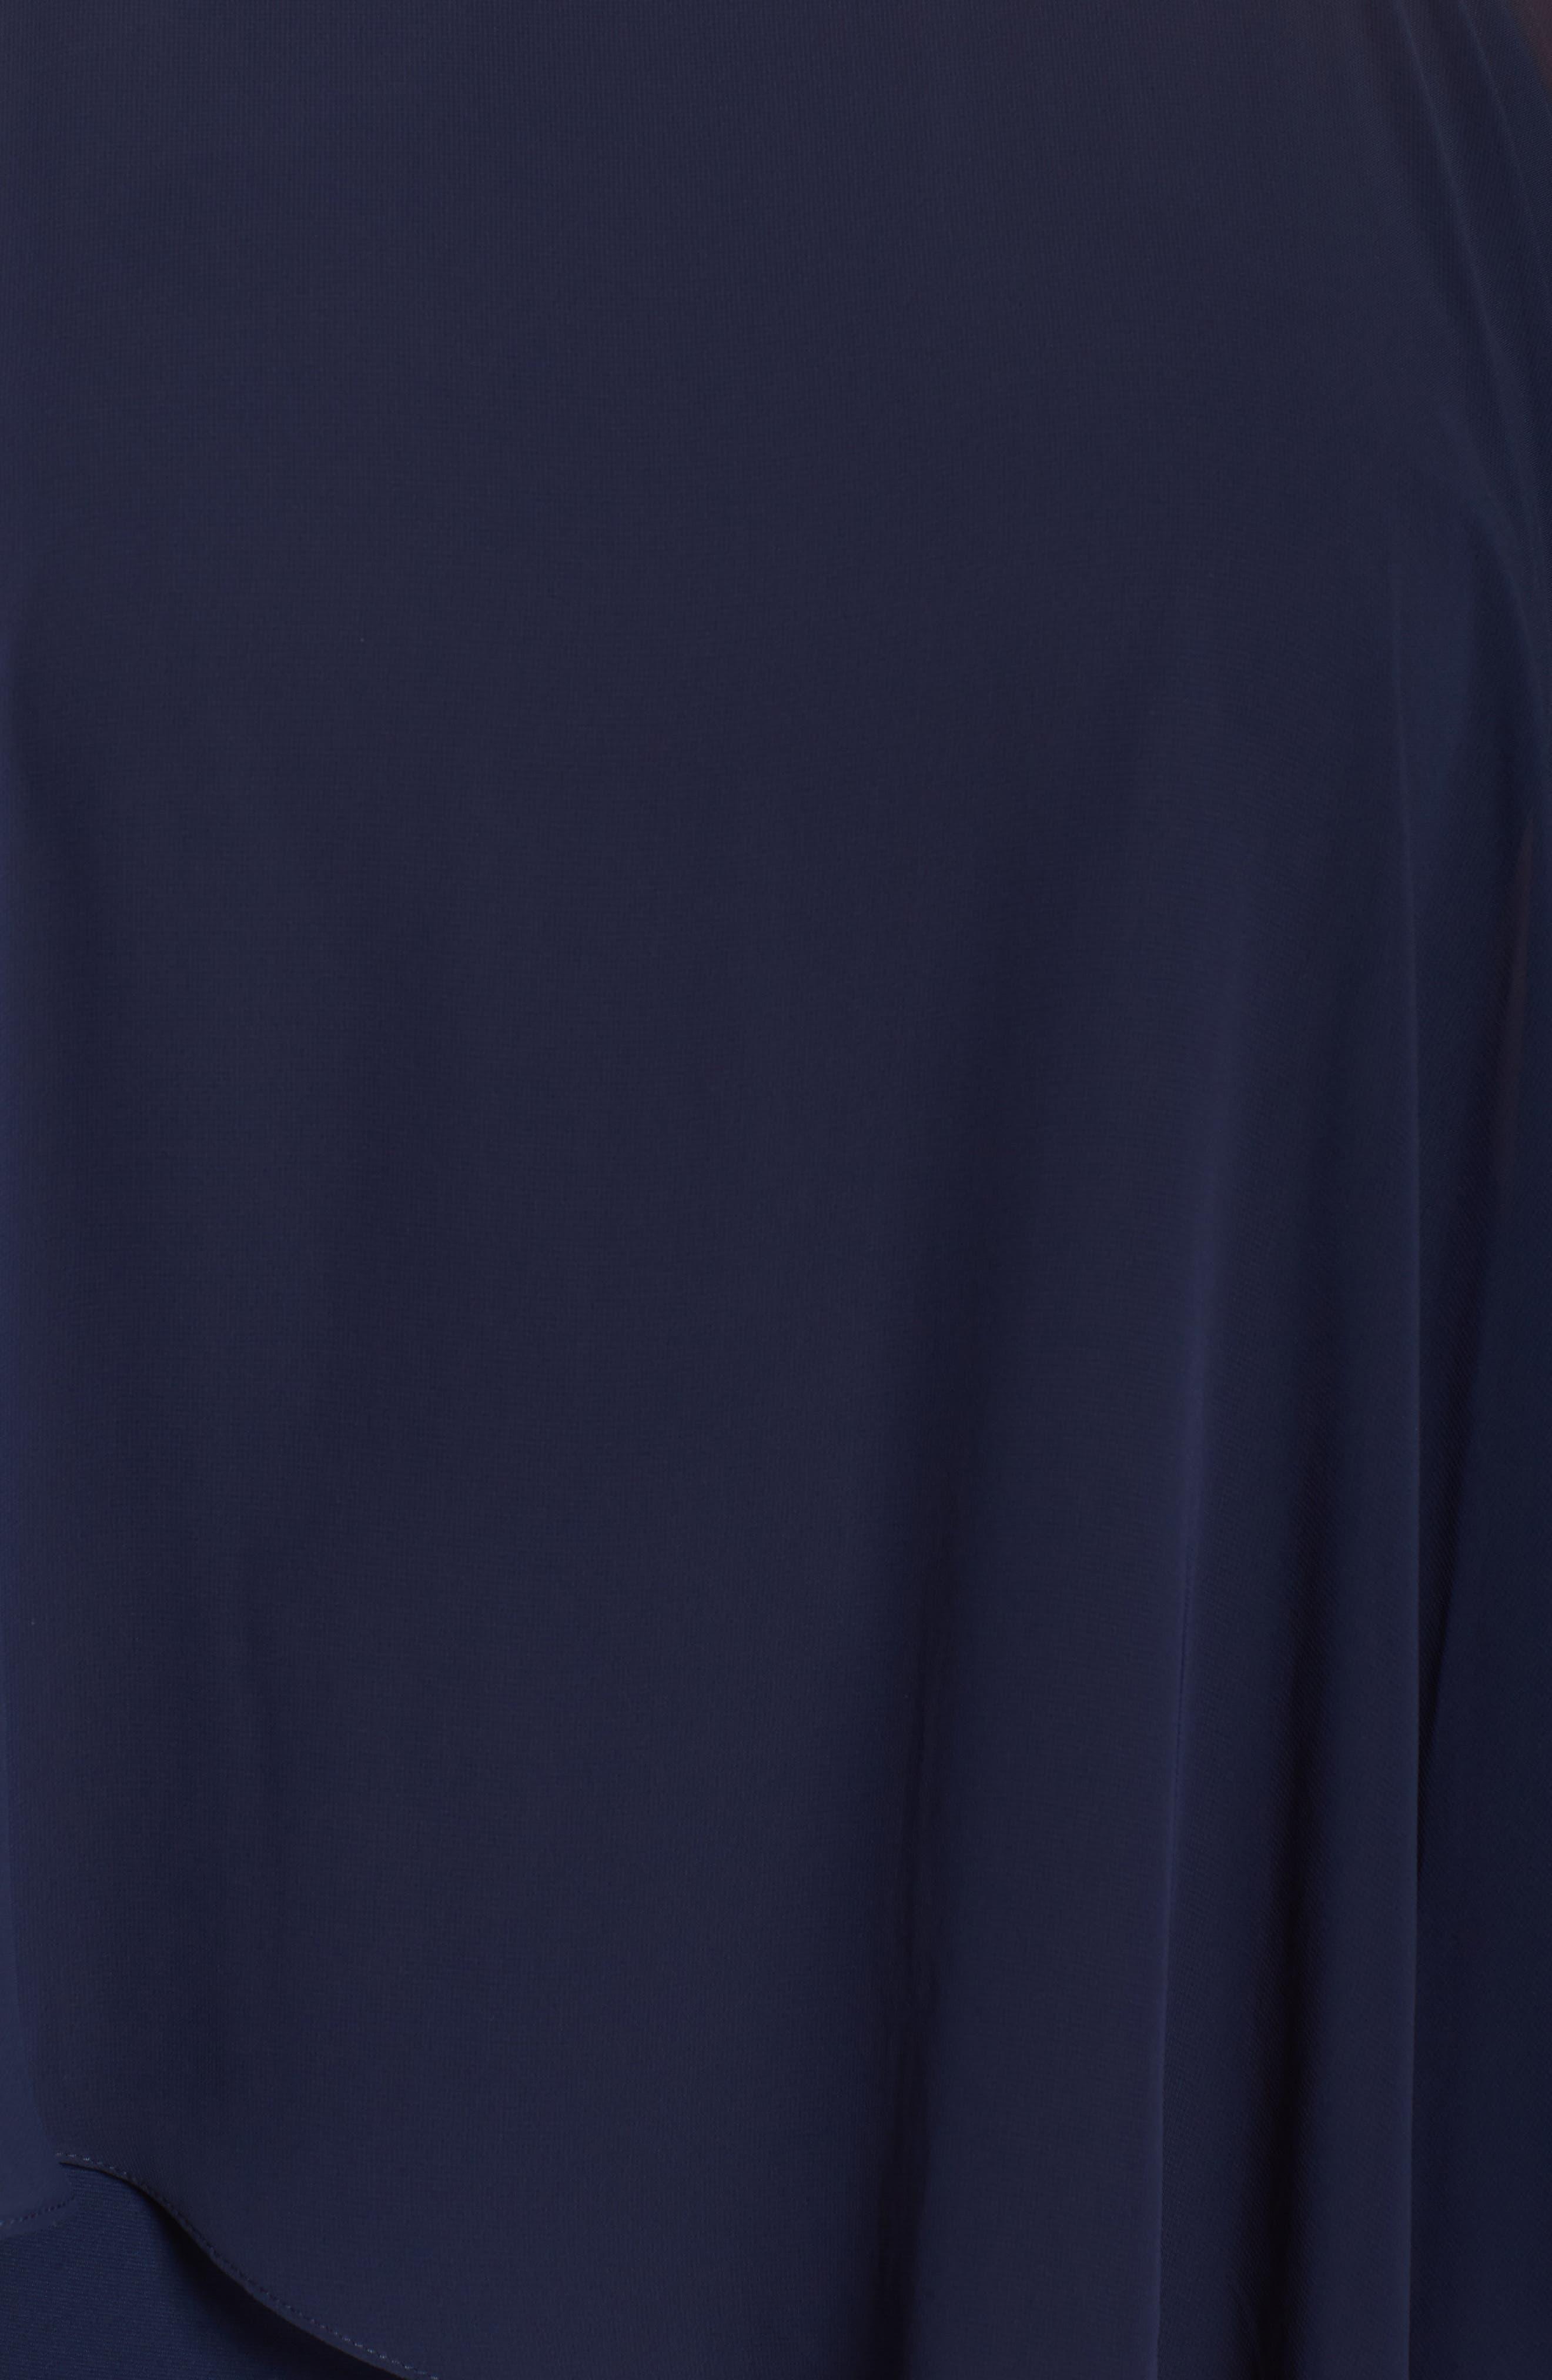 Embellished Chiffon Overlay Sheath Dress,                             Alternate thumbnail 6, color,                             408